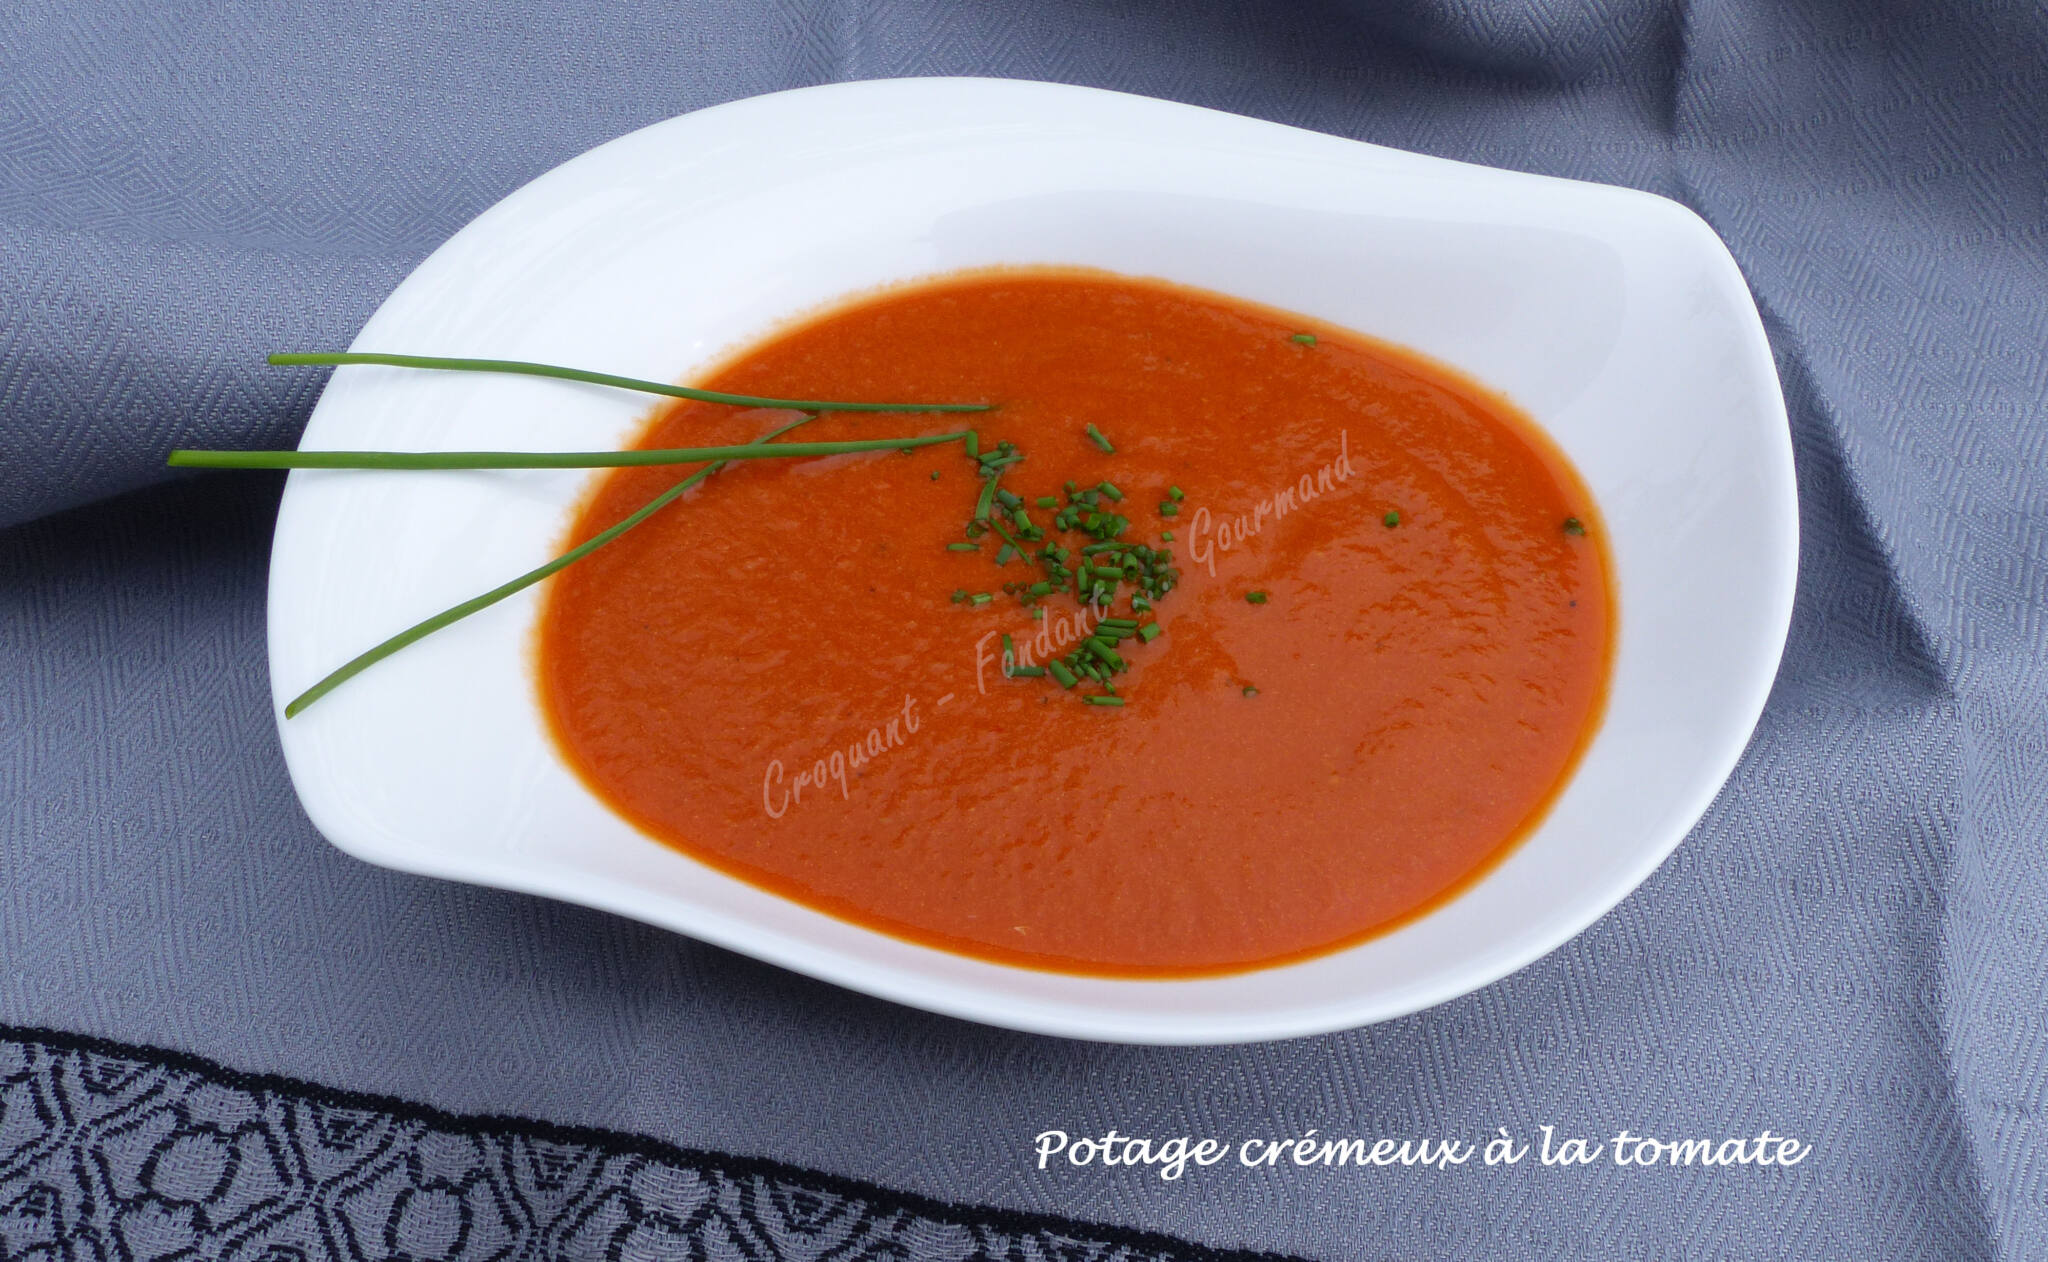 Potage cr meux la tomate croquant fondant gourmand - Potage a la tomate maison ...